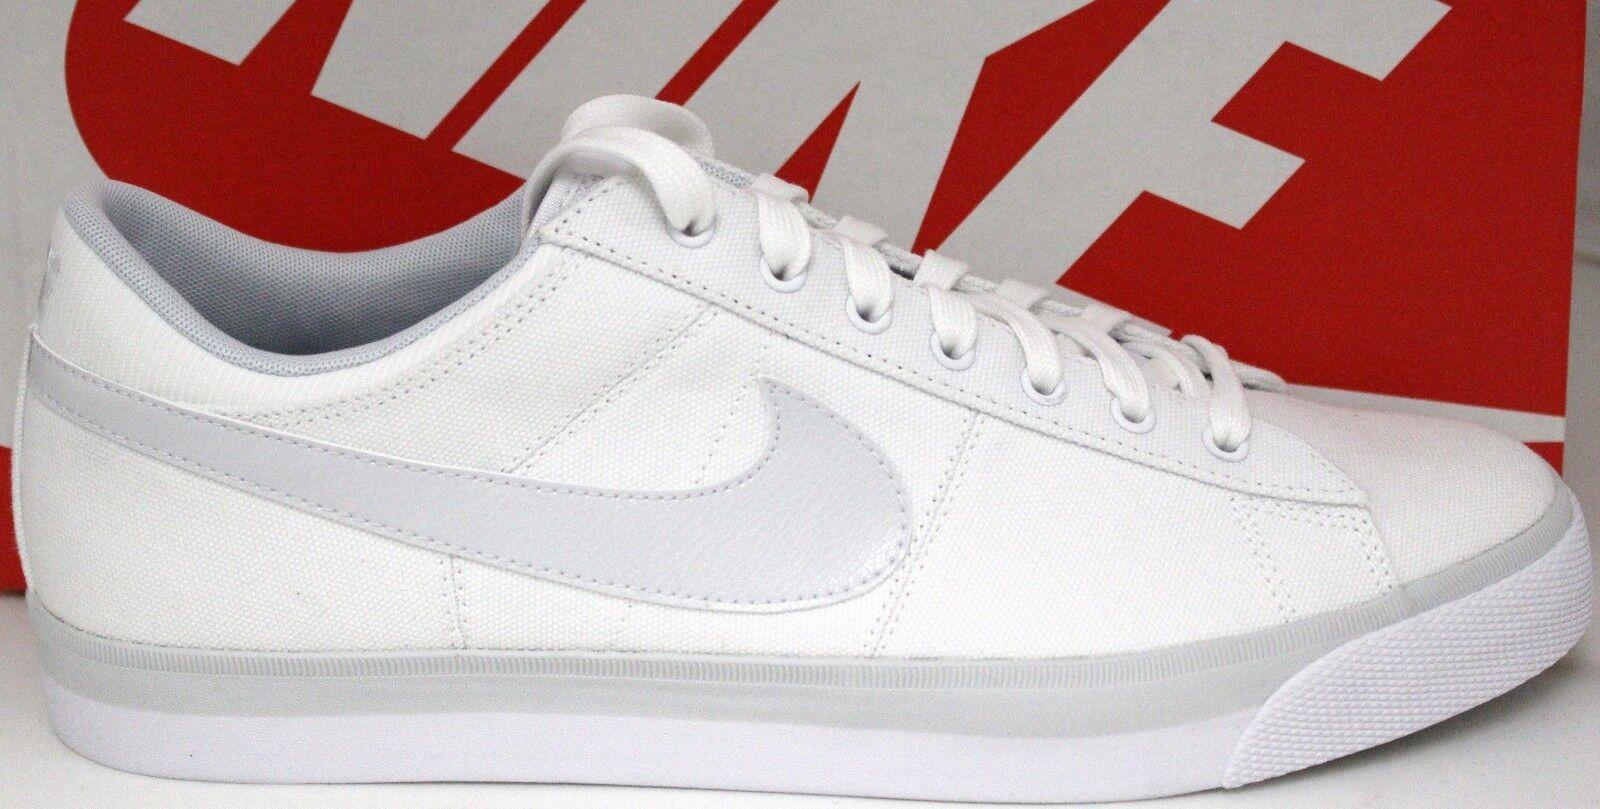 Nike Match Supreme Prem 631658101 blancoo   Platino Nuevo en Caja